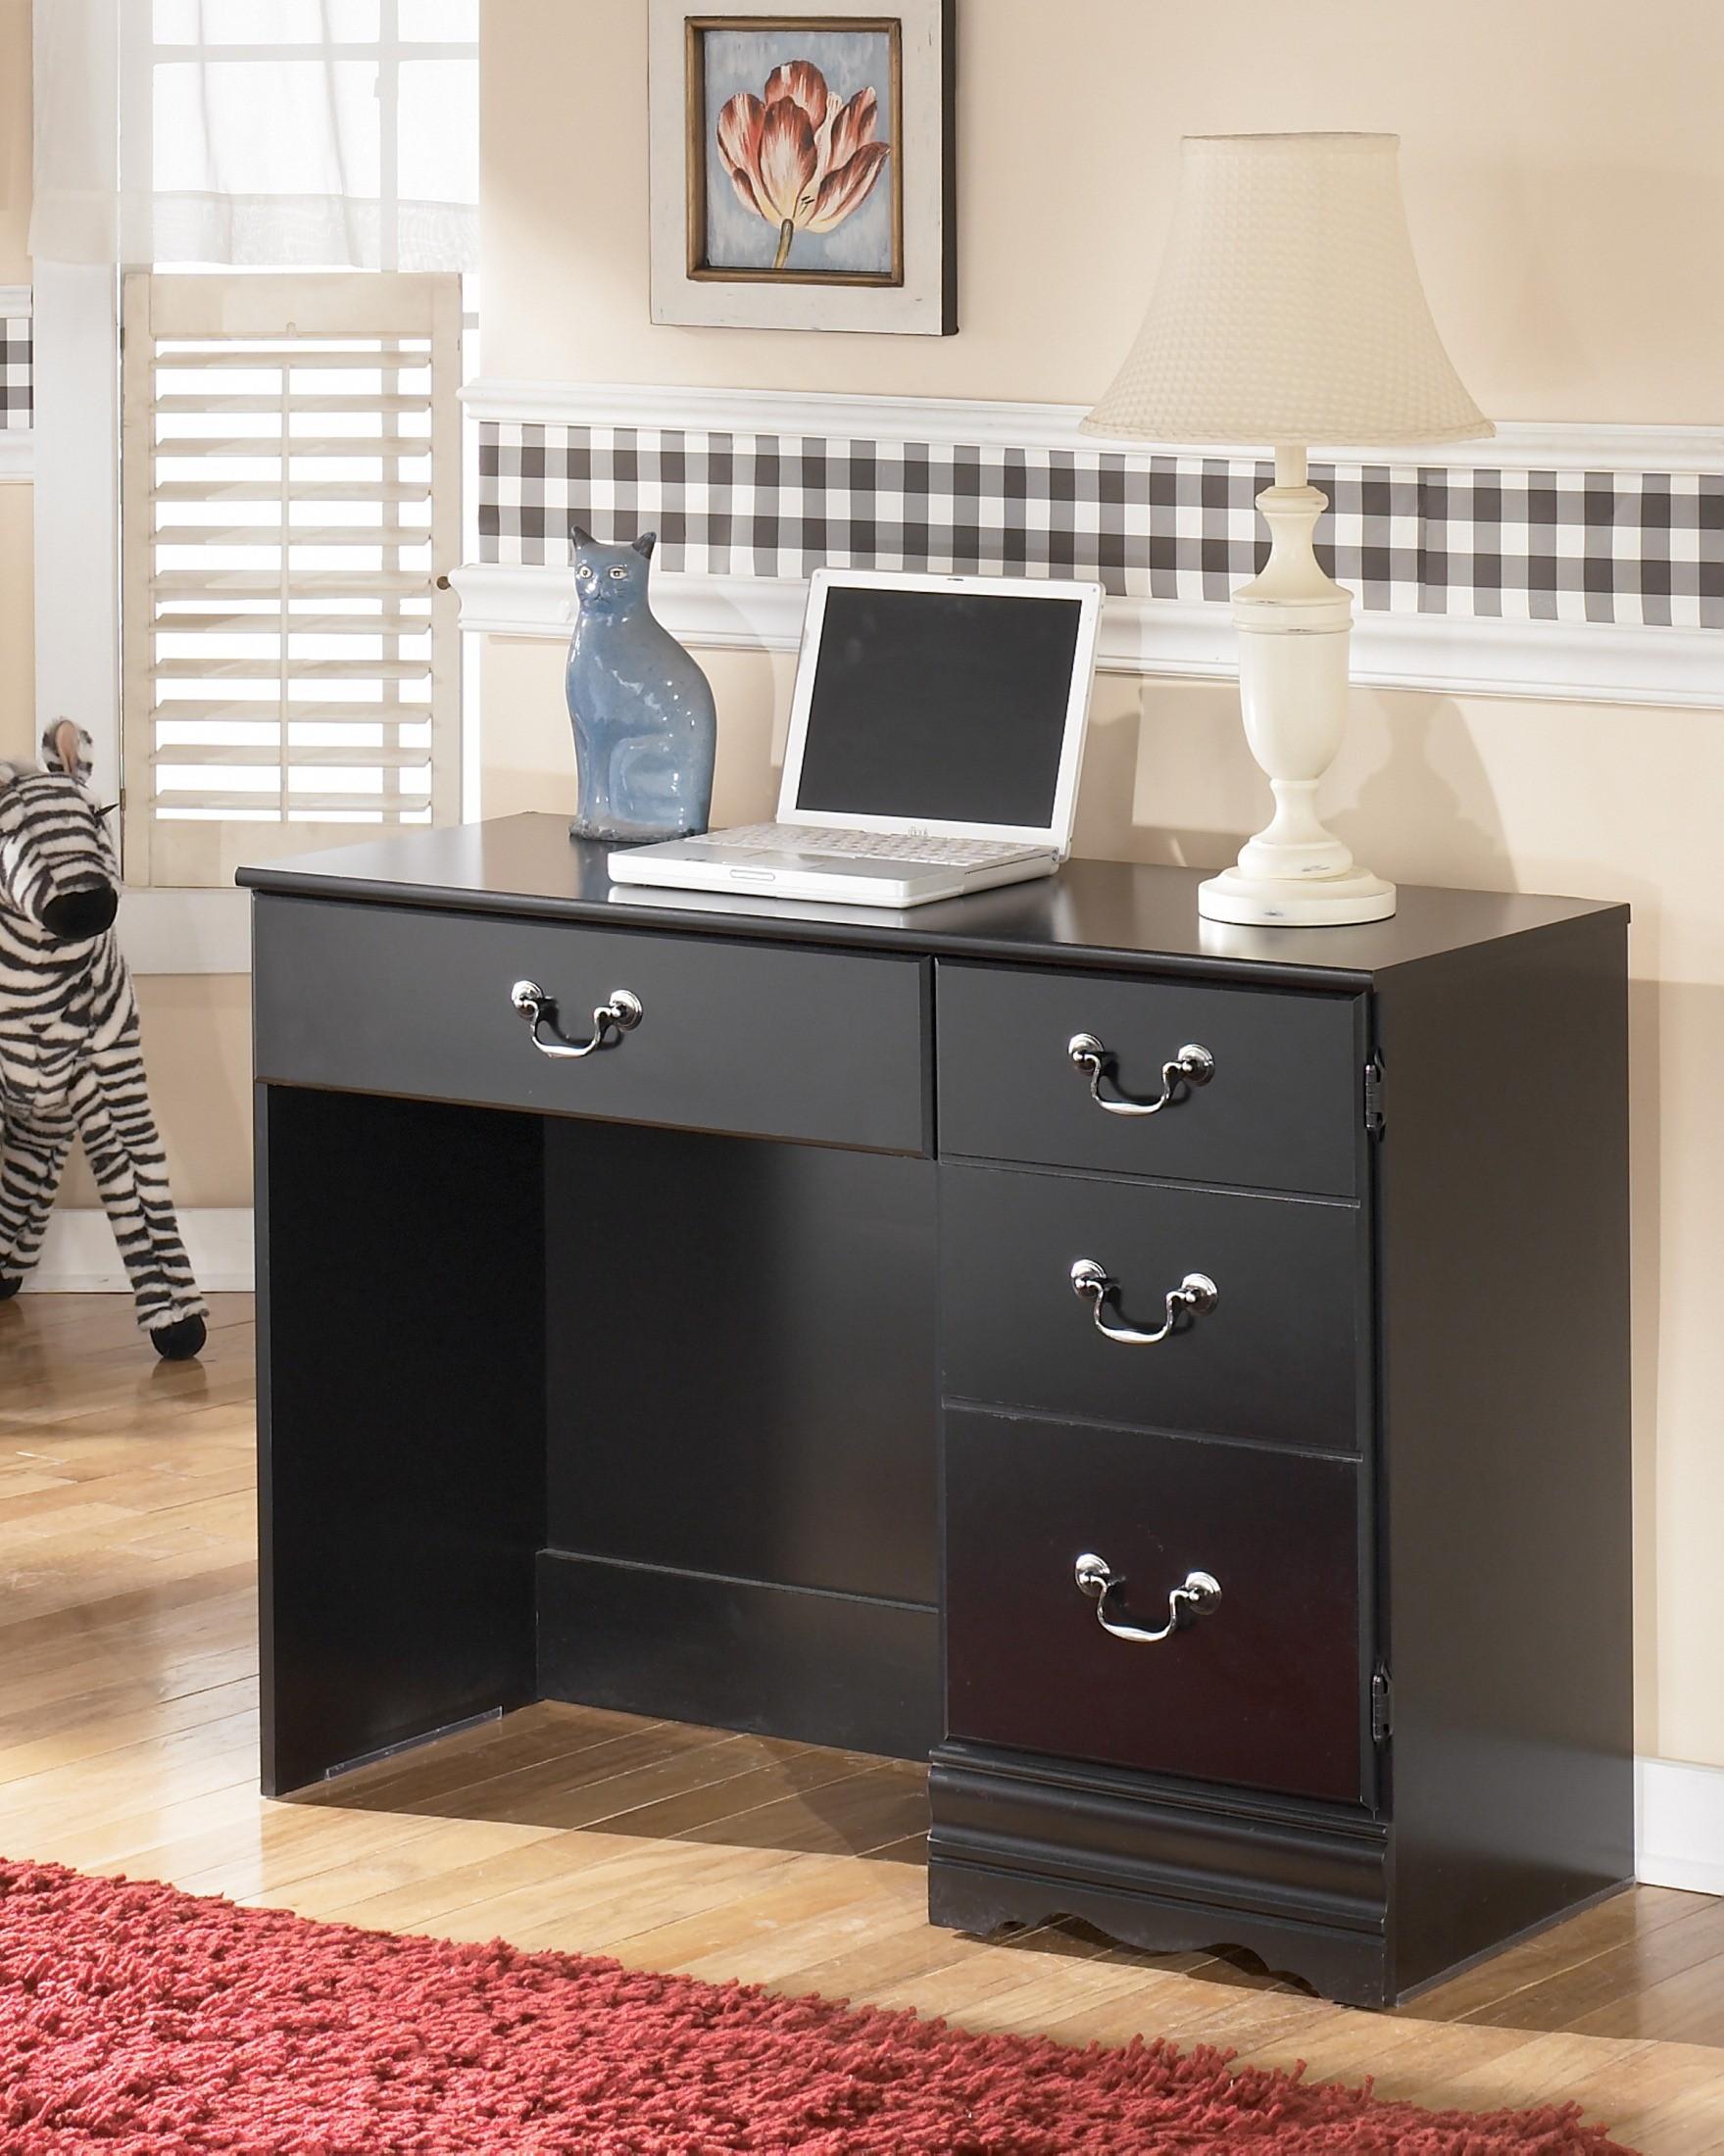 Huey Vineyard Bedroom Set From Ashley B128 77 74 98 Coleman Furniture